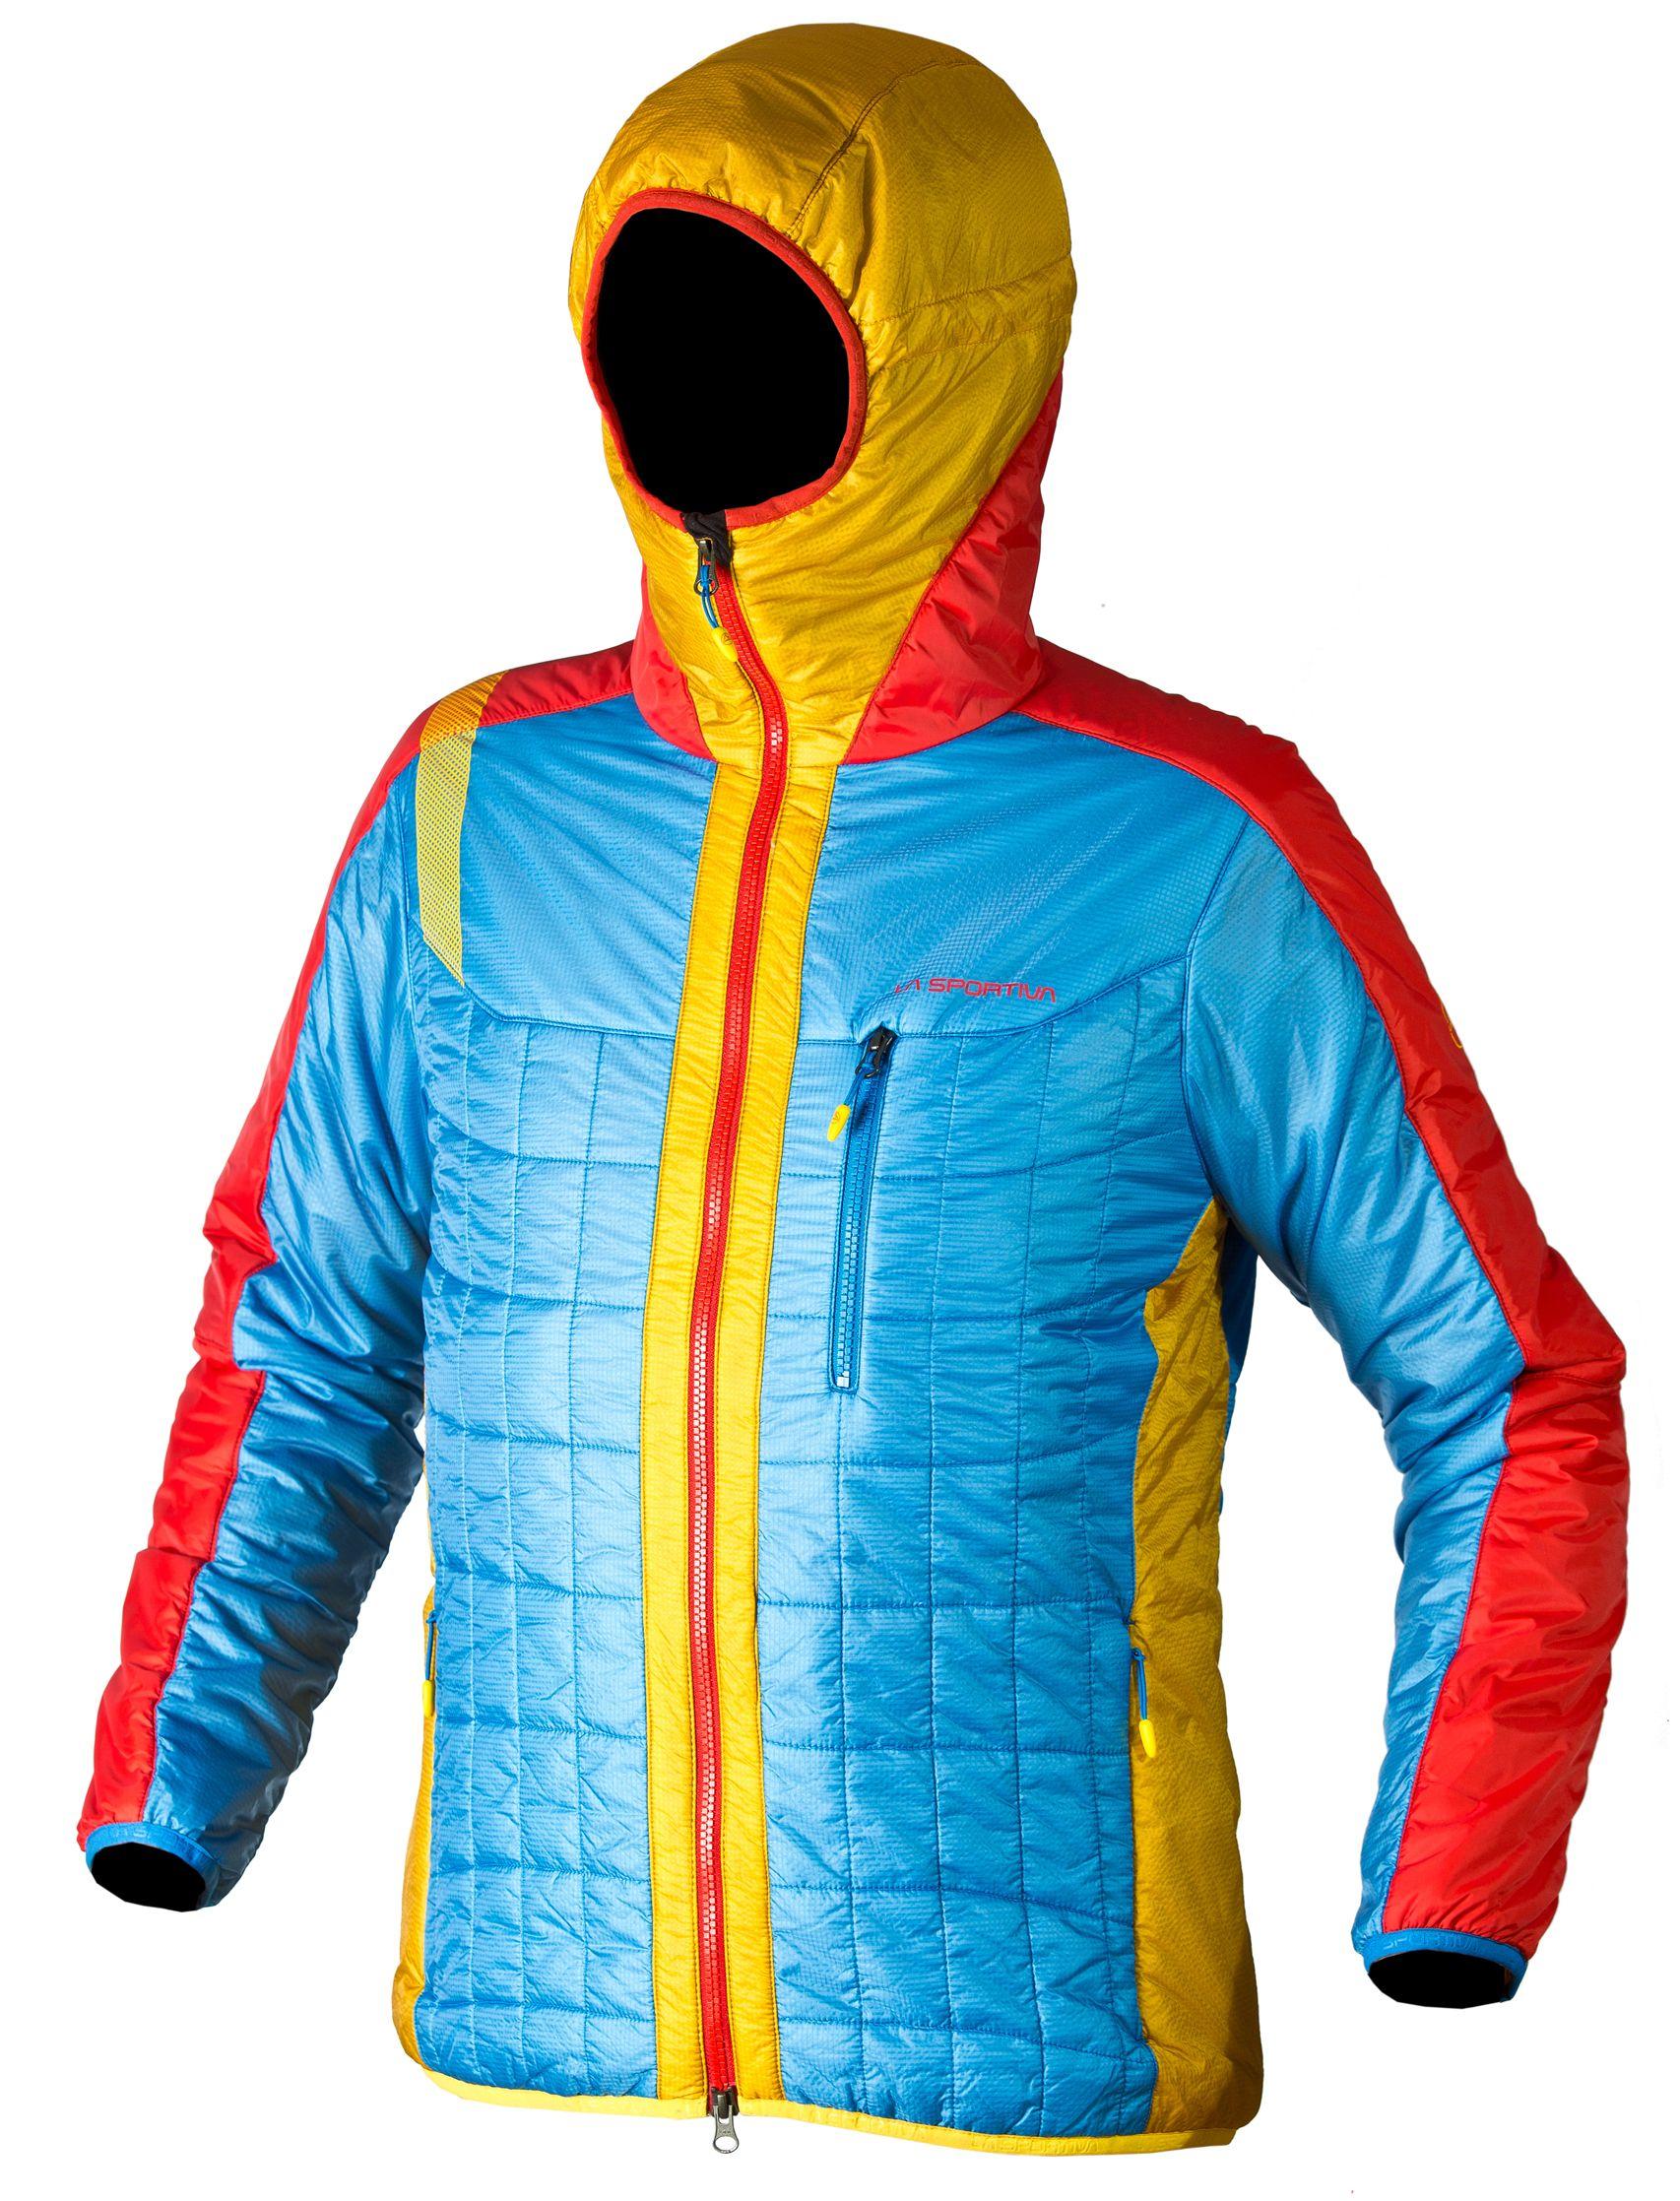 Sea Blue Nugget M La Sportiva Spire Jacket